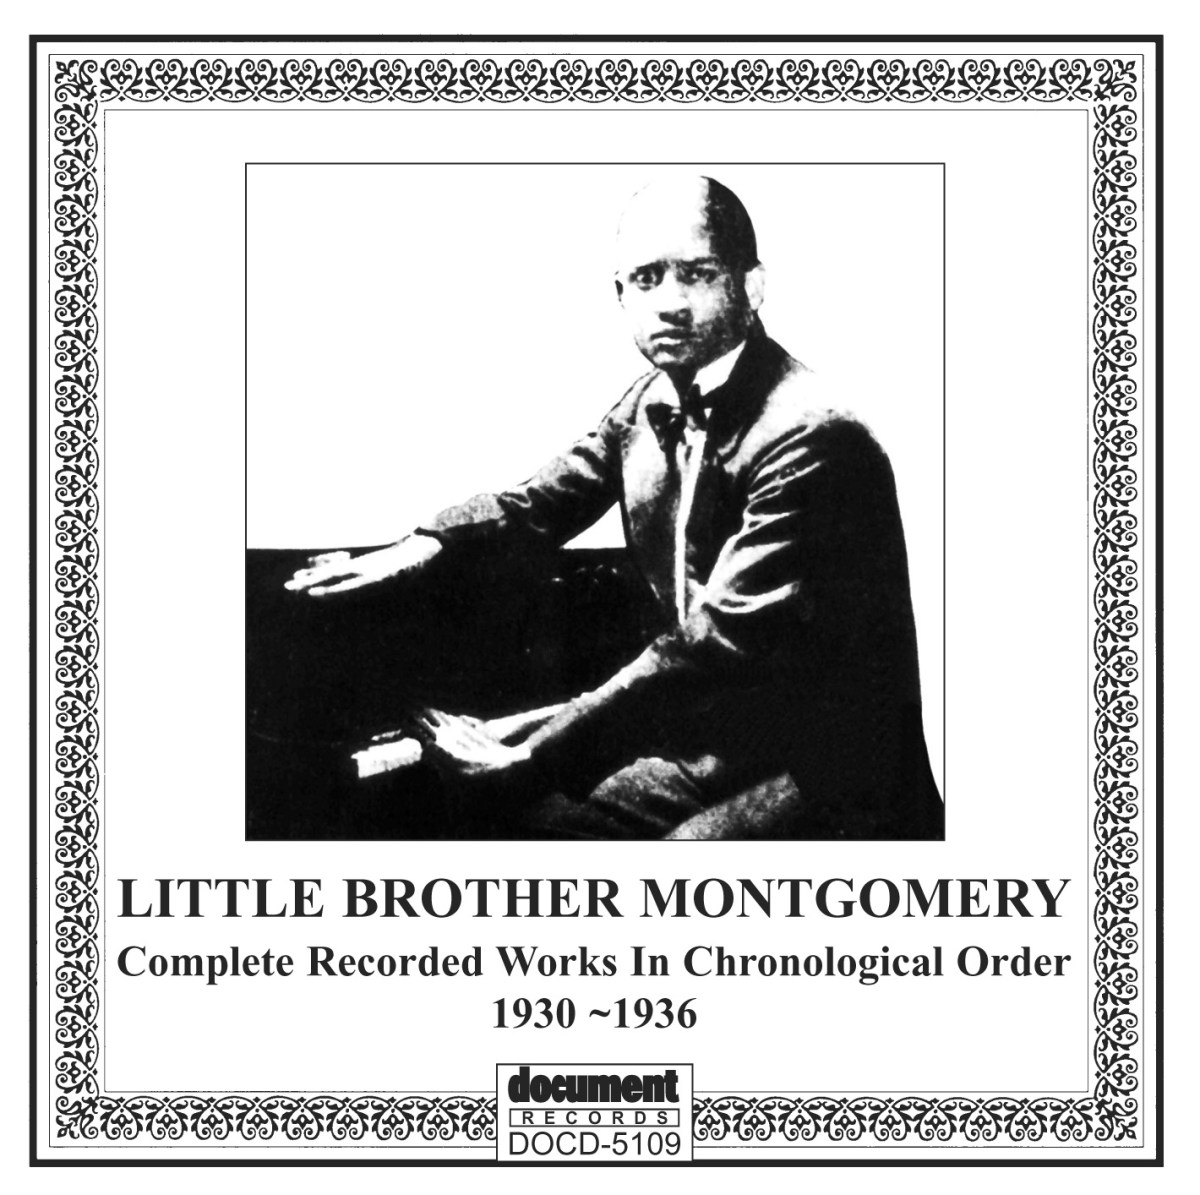 Little Brother Montgomery (1930-1936) – Full Album